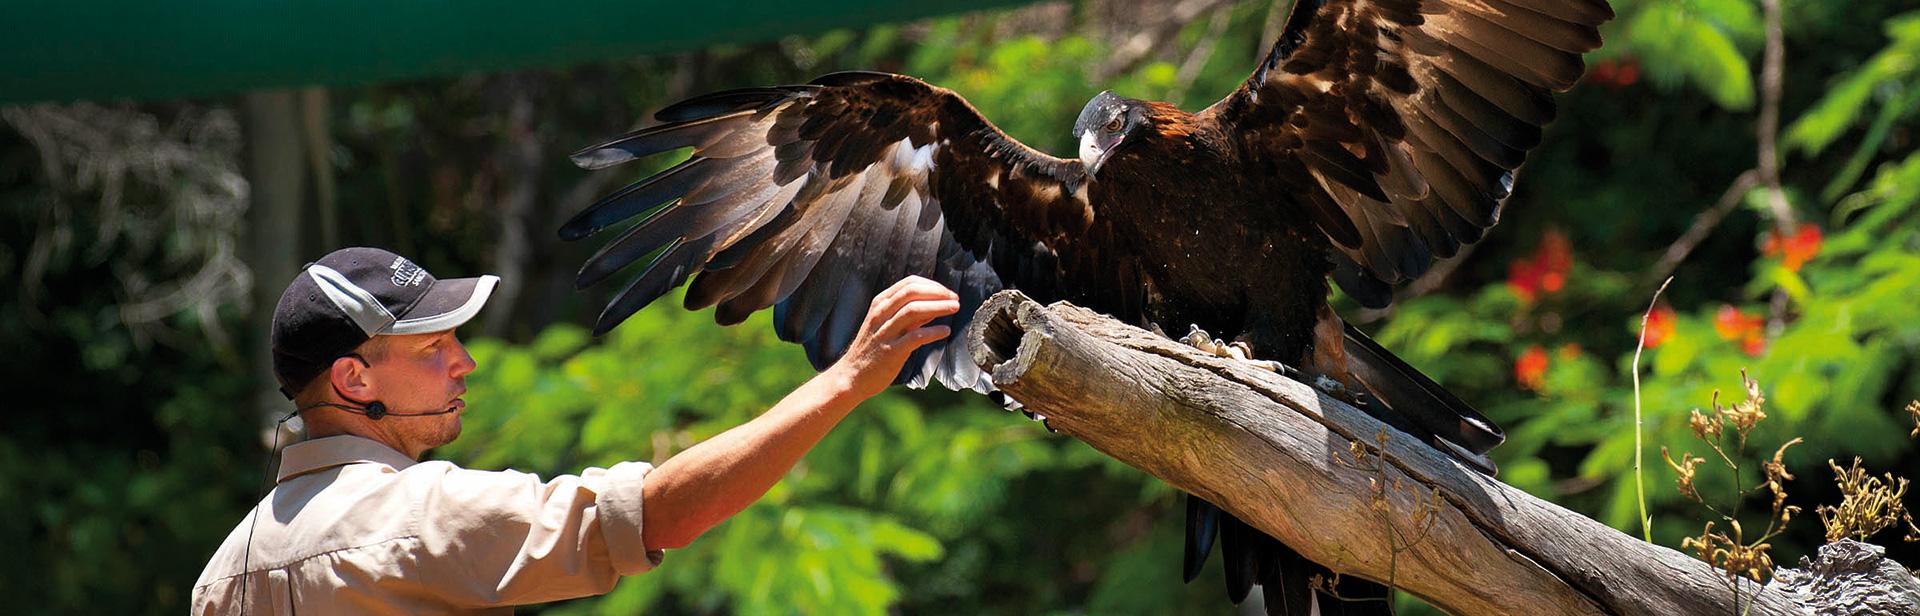 currumbin eagle-Final.jpg